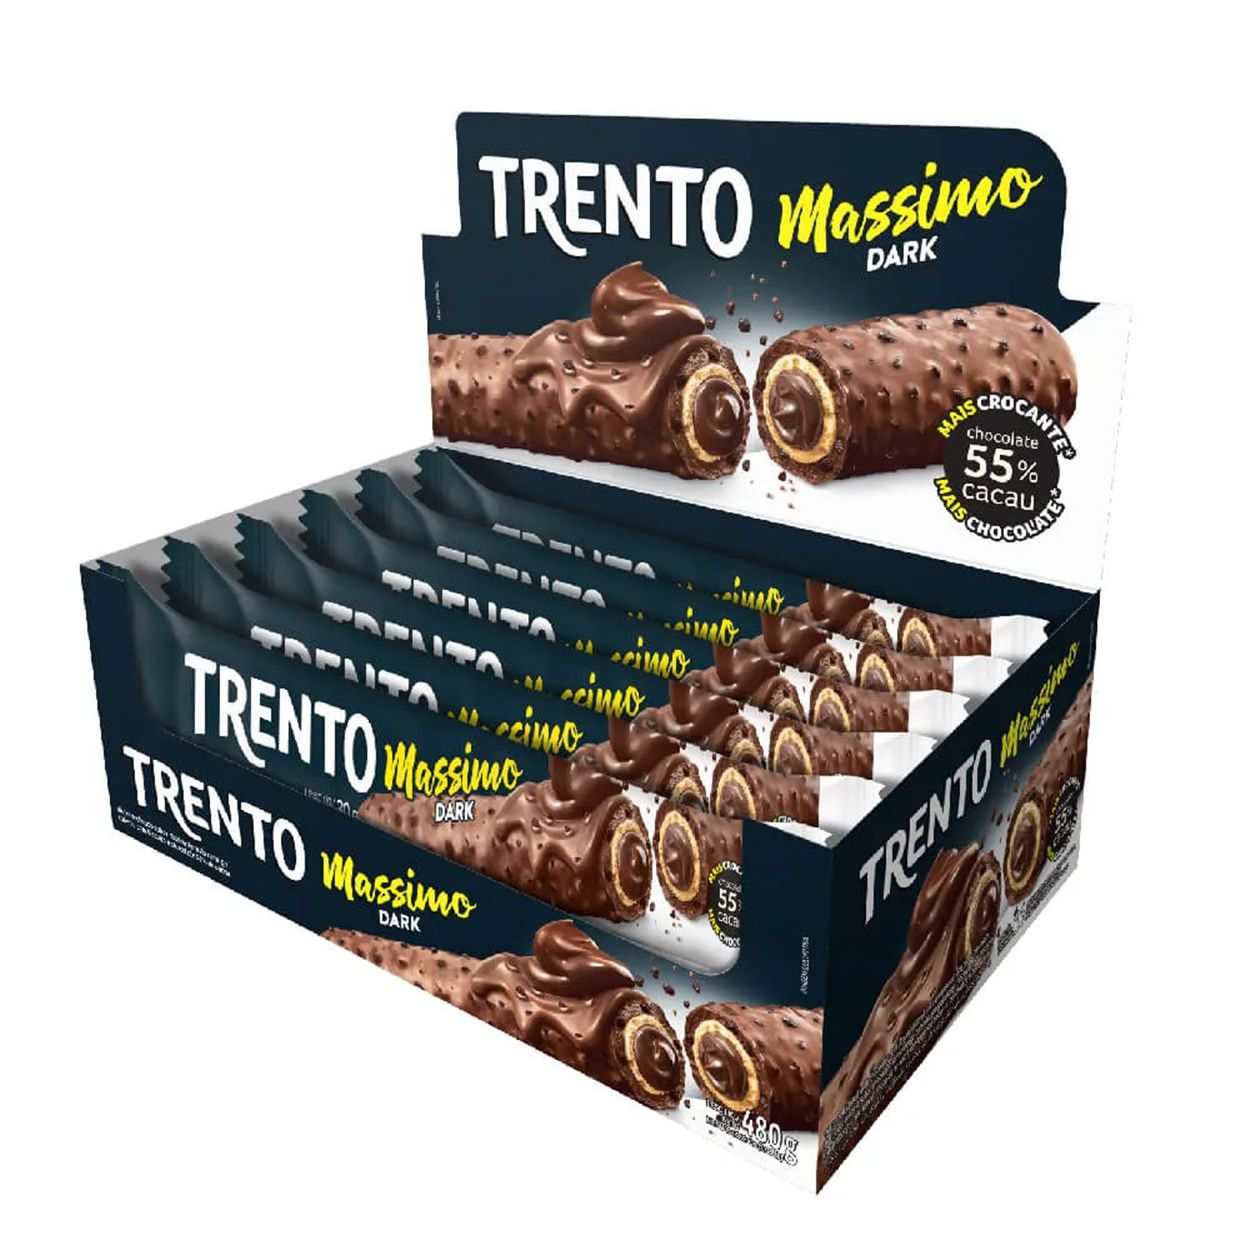 Chocolate Trento Massimo Dark c/16 - Peccin